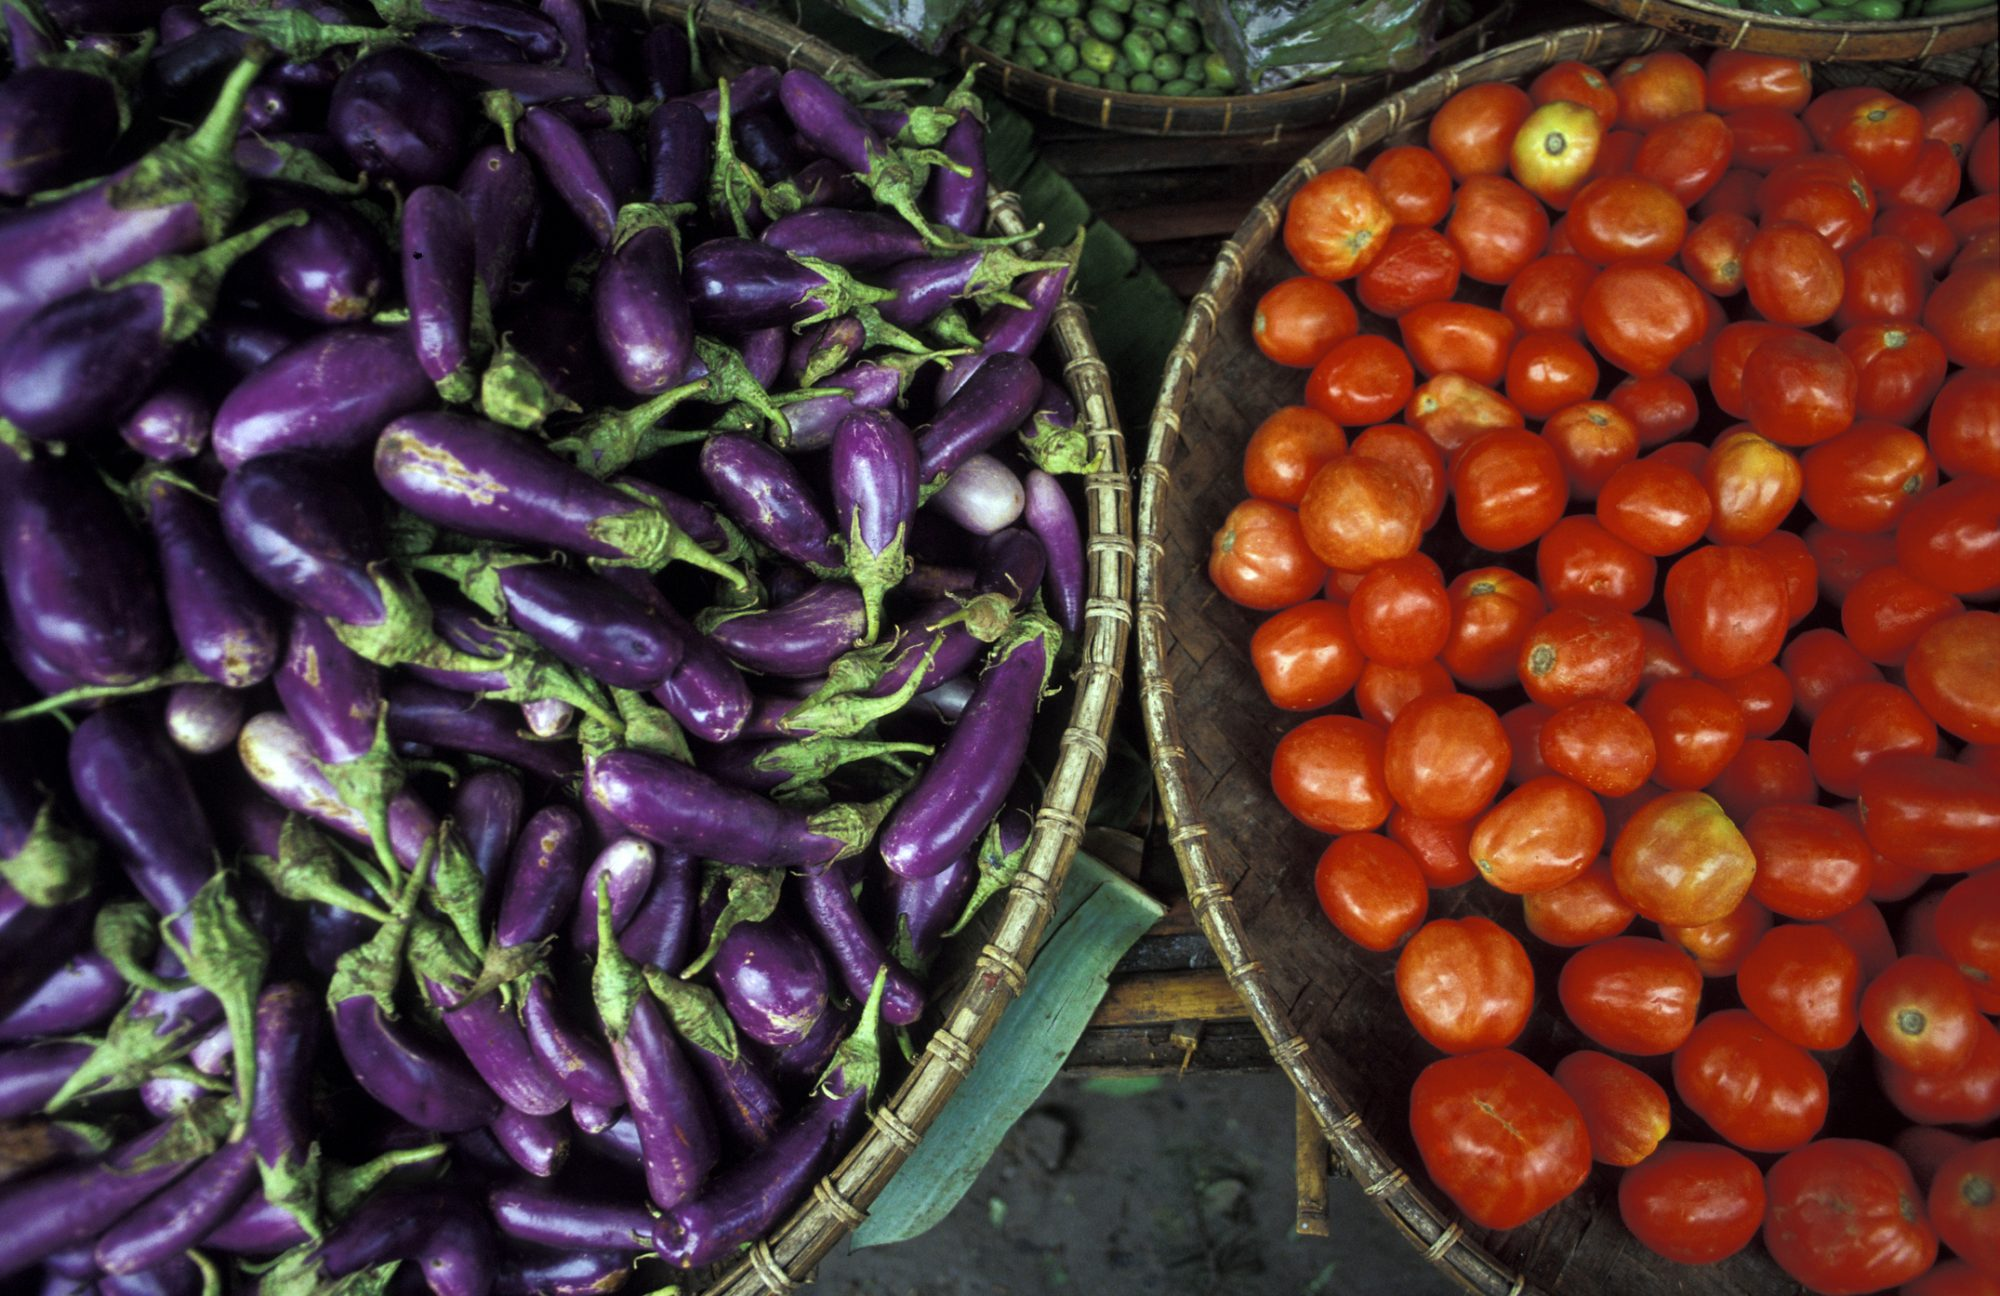 eggplant-and-tomato-getty-image